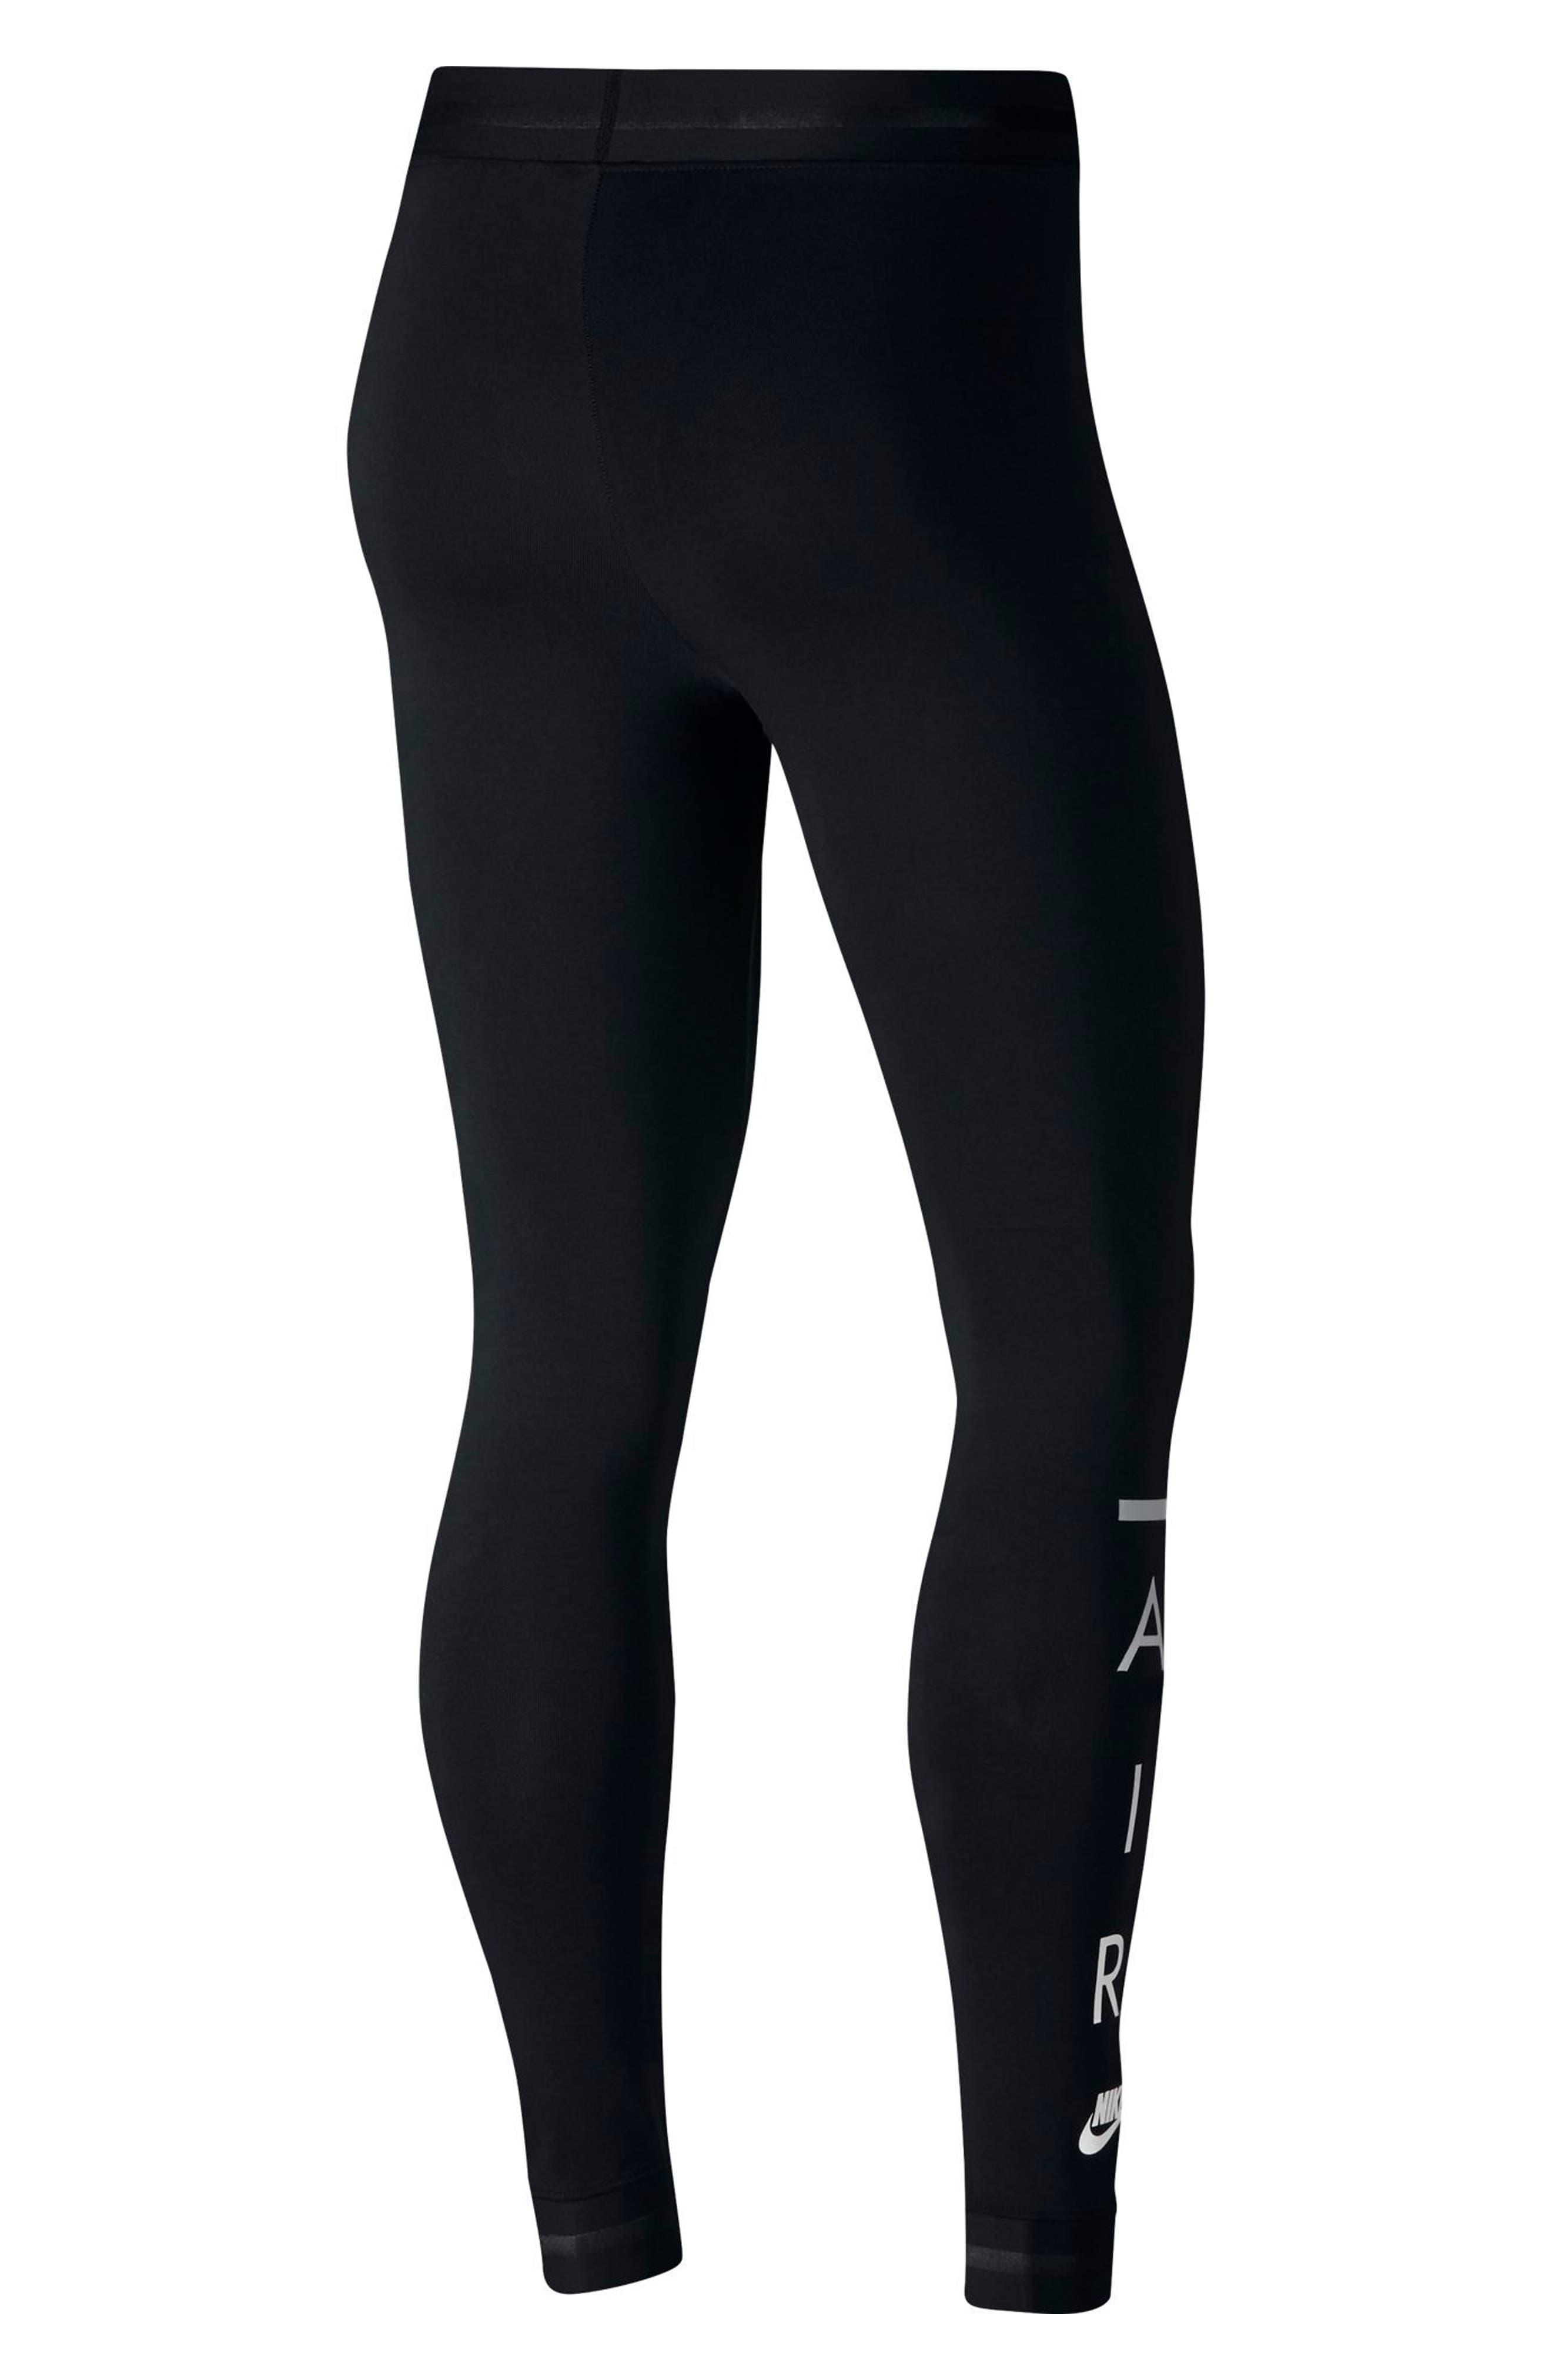 Sportswear Women's Leggings,                             Alternate thumbnail 2, color,                             BLACK/ BLACK/ BLACK